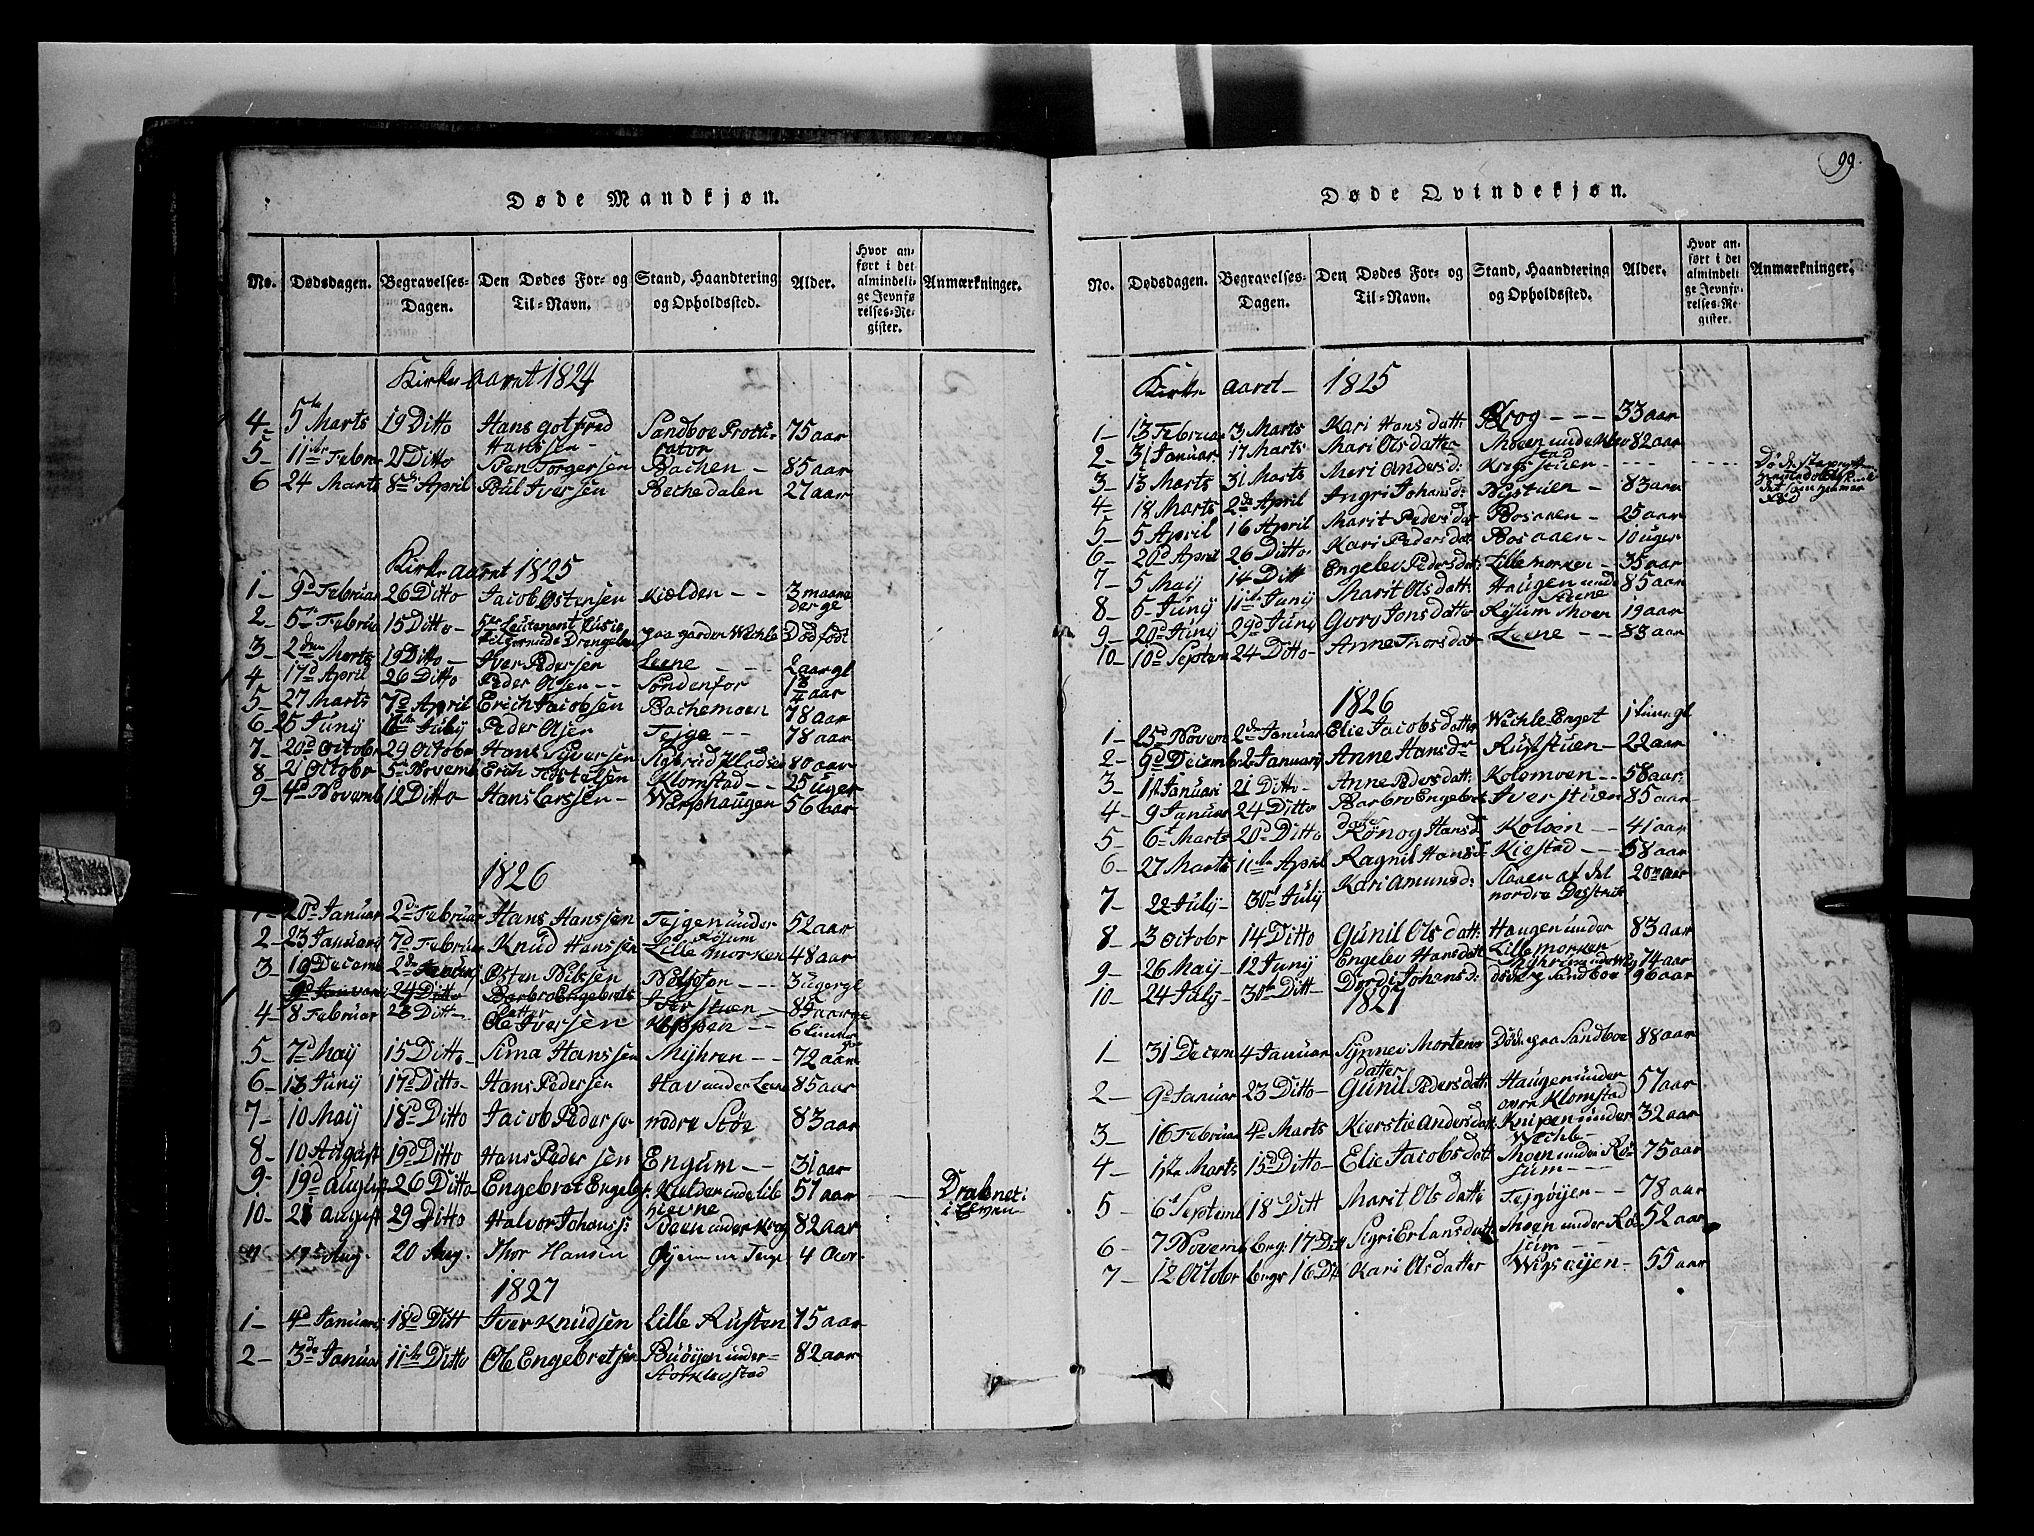 SAH, Fron prestekontor, H/Ha/Hab/L0002: Klokkerbok nr. 2, 1816-1850, s. 99